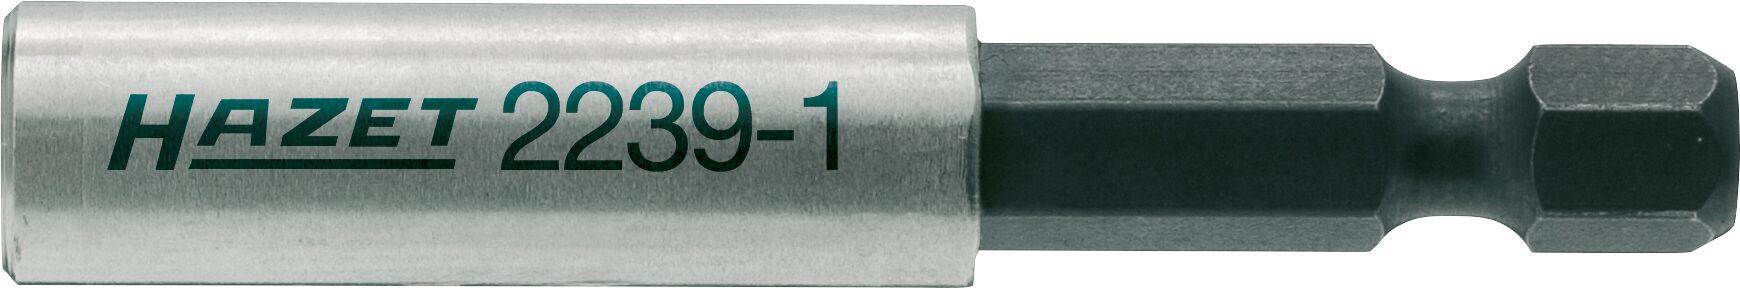 HAZET Adapter 2239-1 ∙ Sechskant massiv 6,3 (1/4 Zoll) ∙ Sechskant hohl 6,3 (1/4 Zoll)